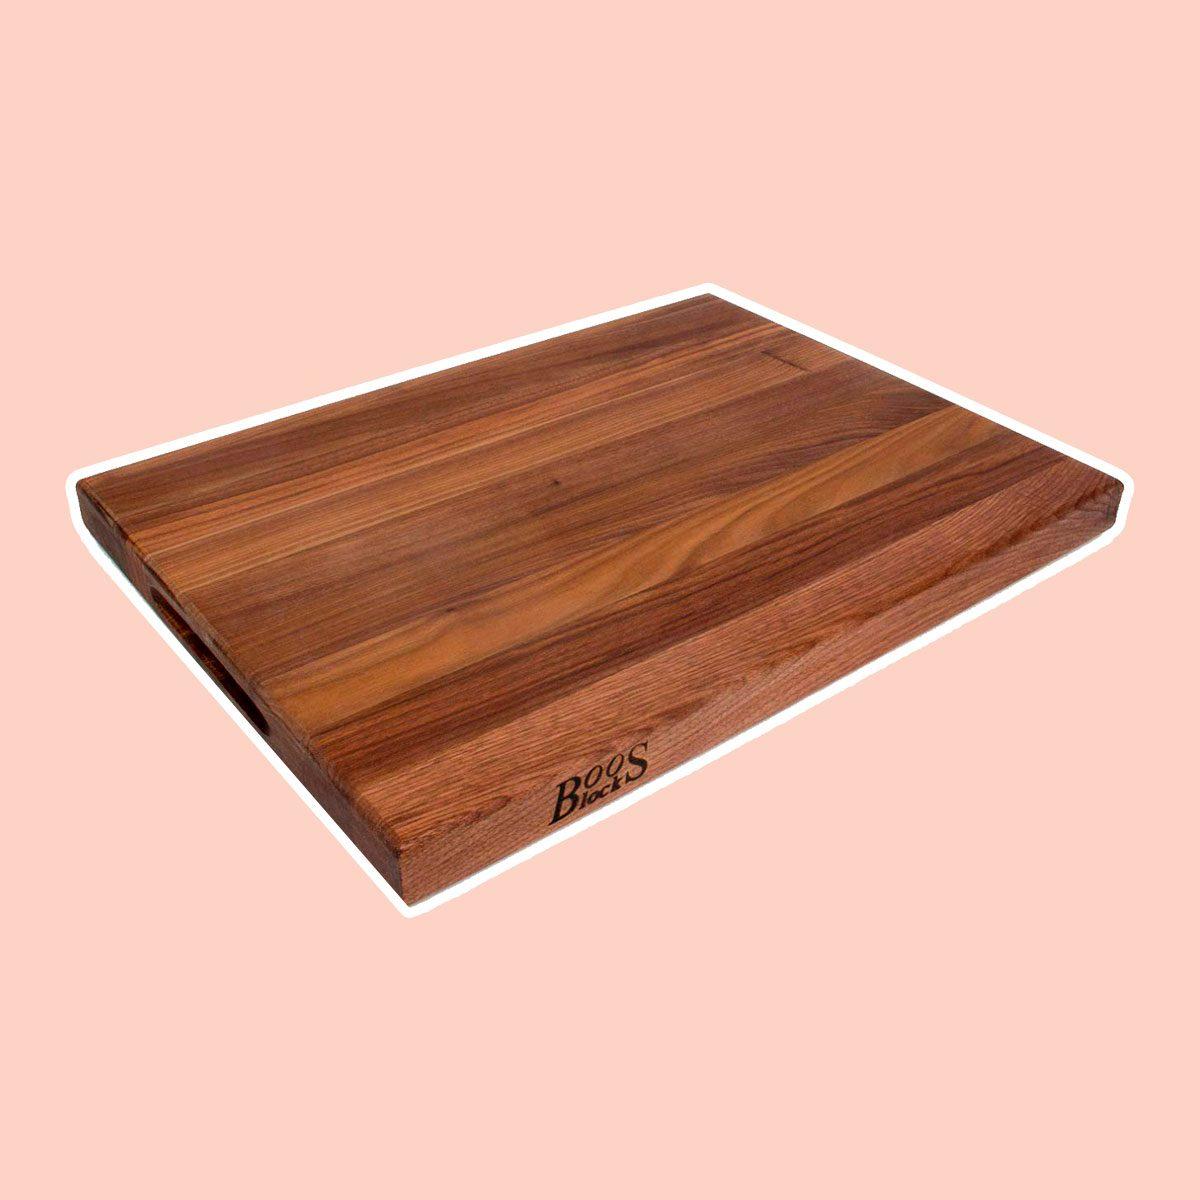 Boos Cutting Board